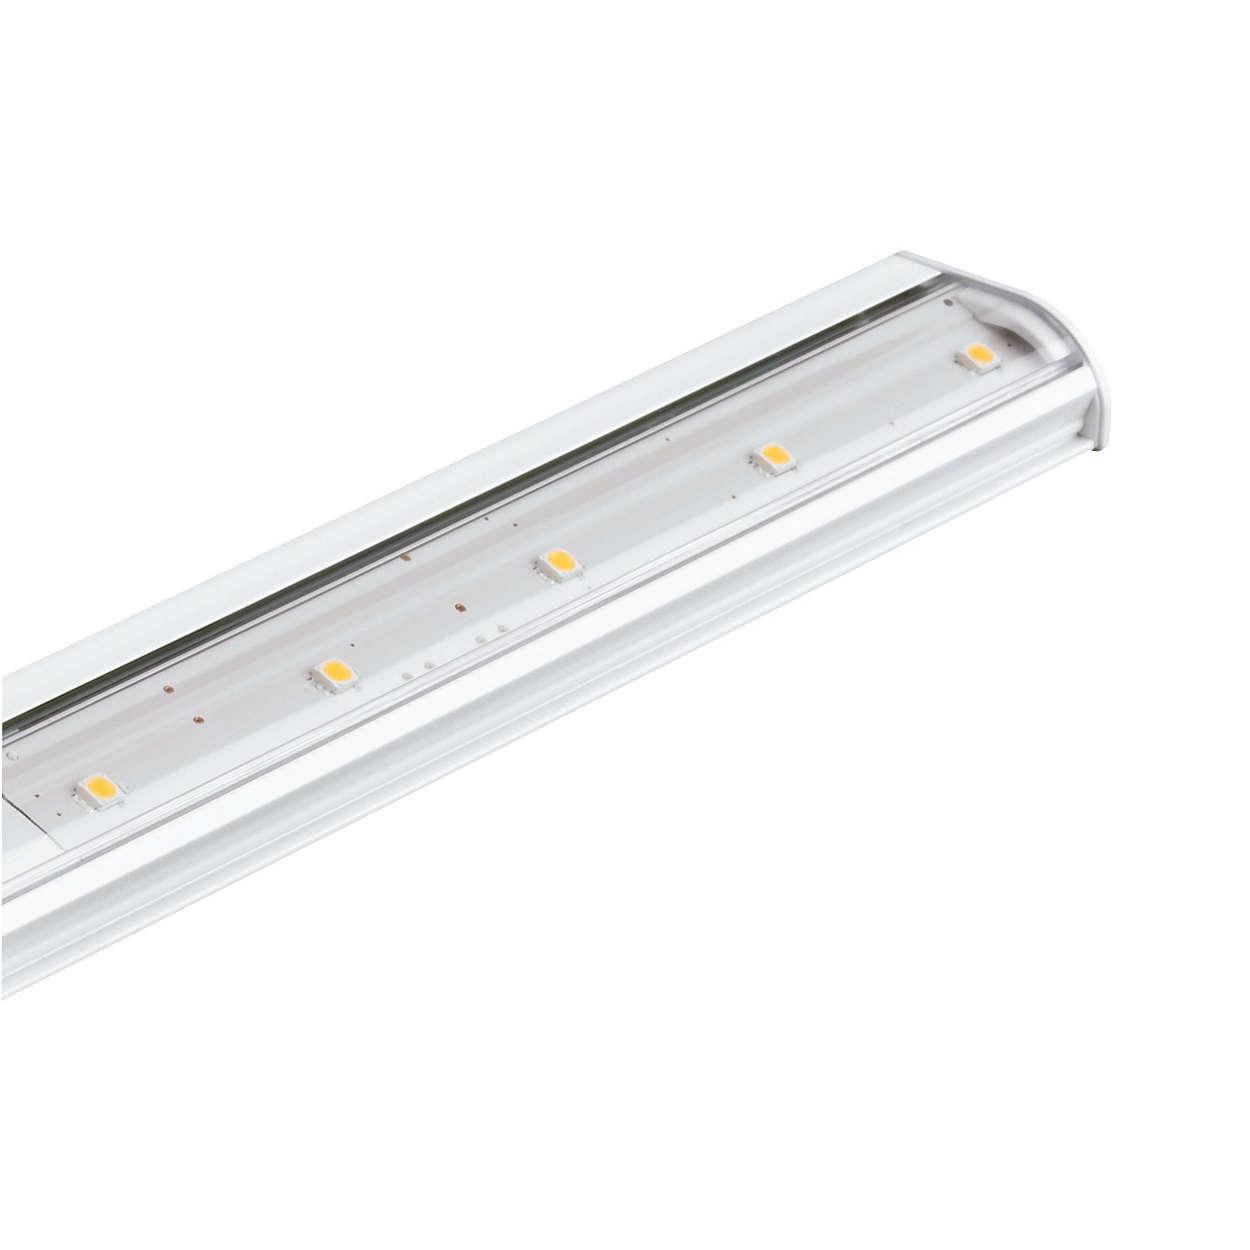 eW Profile Powercore: luminaria LED de luz blanca bajo vitrina de perfil ultrabajo